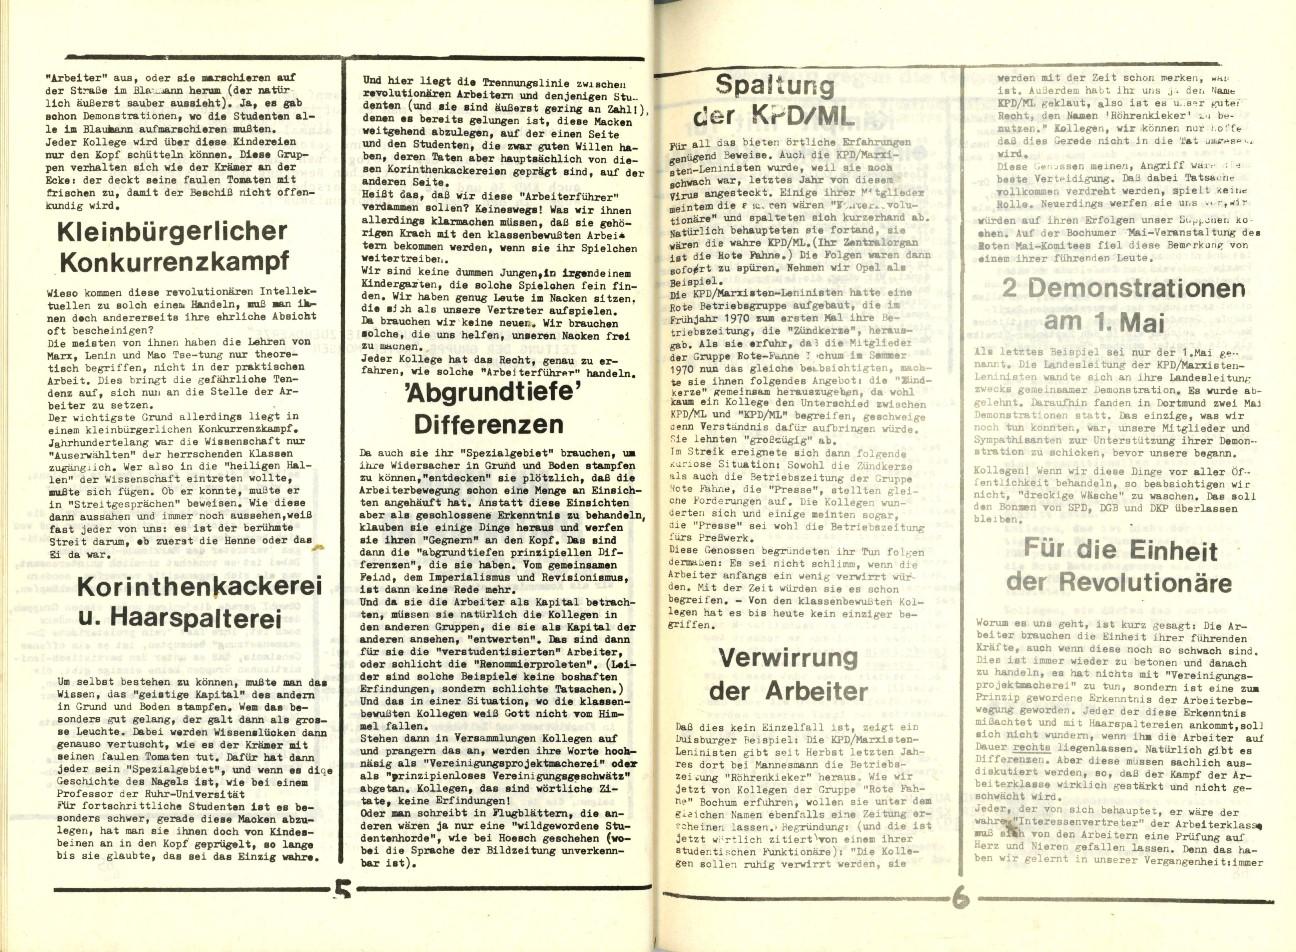 ZB_Parteiarbeiter_1971_06_35